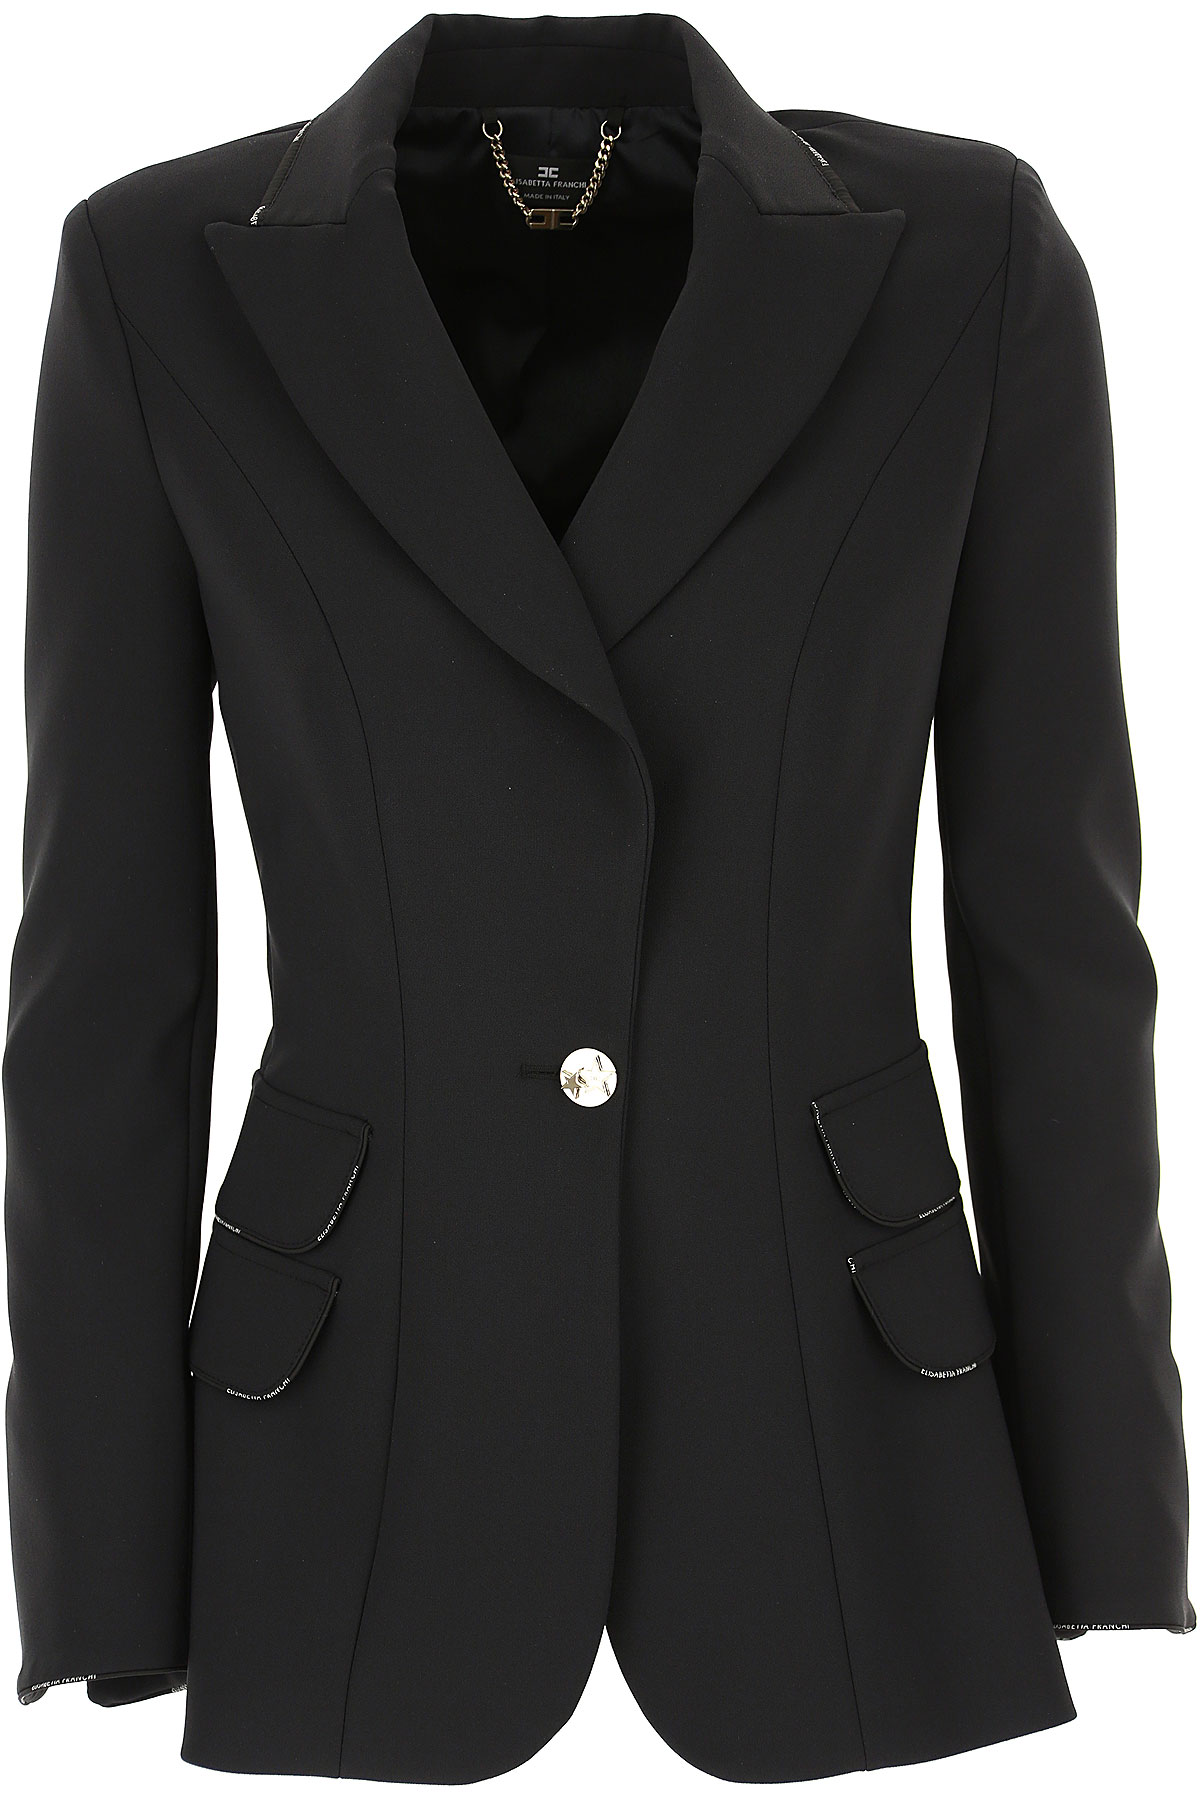 Elisabetta Franchi Blazer for Women On Sale, Black, polyestere, 2019, 4 6 8